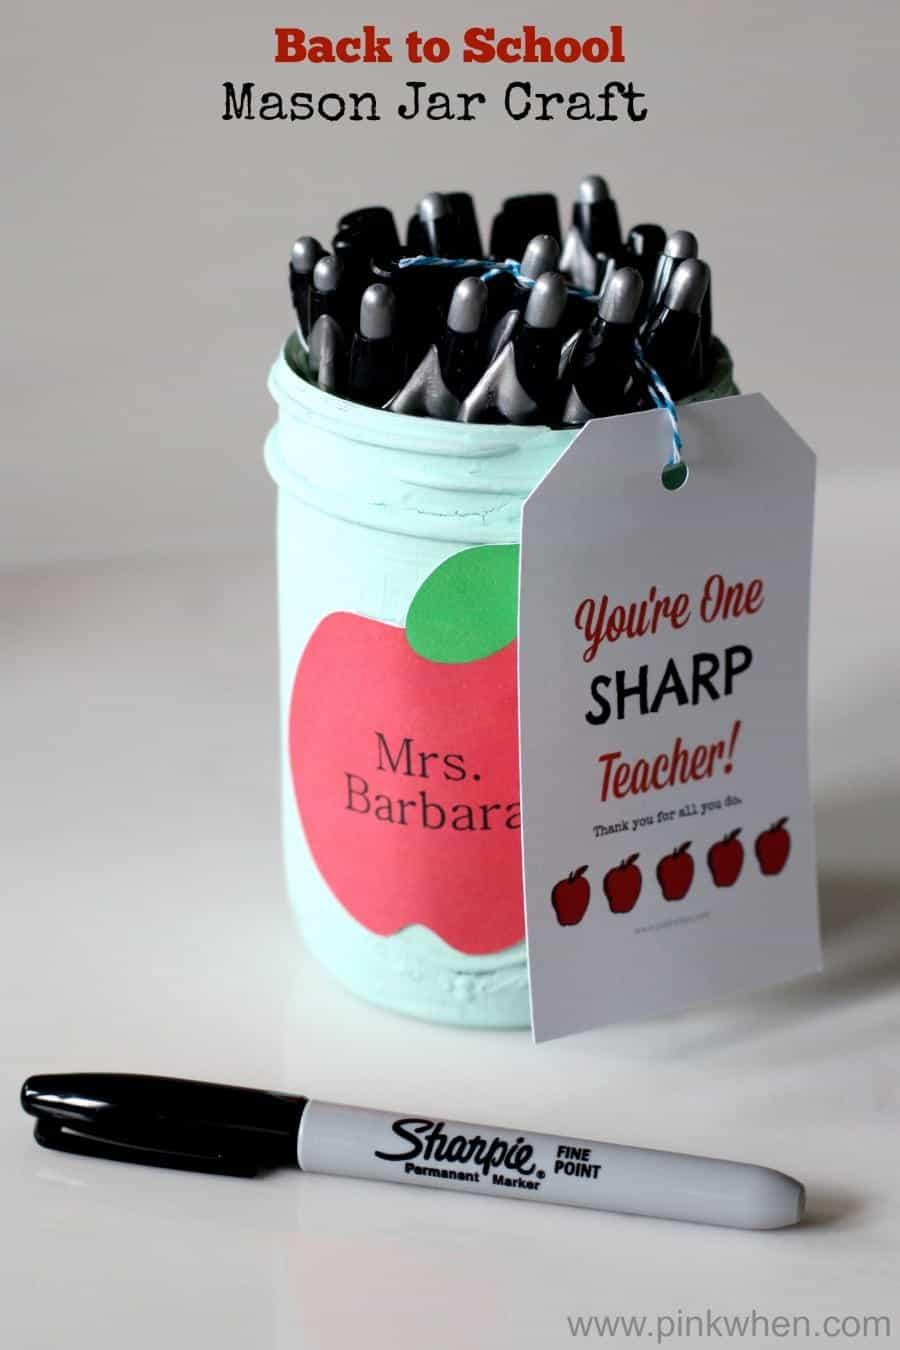 Back-to-School-Mason-Jar-Craft-Teacher-Gift-Idea-inspirestudents-teacherschangelives-pmedia-ad-6